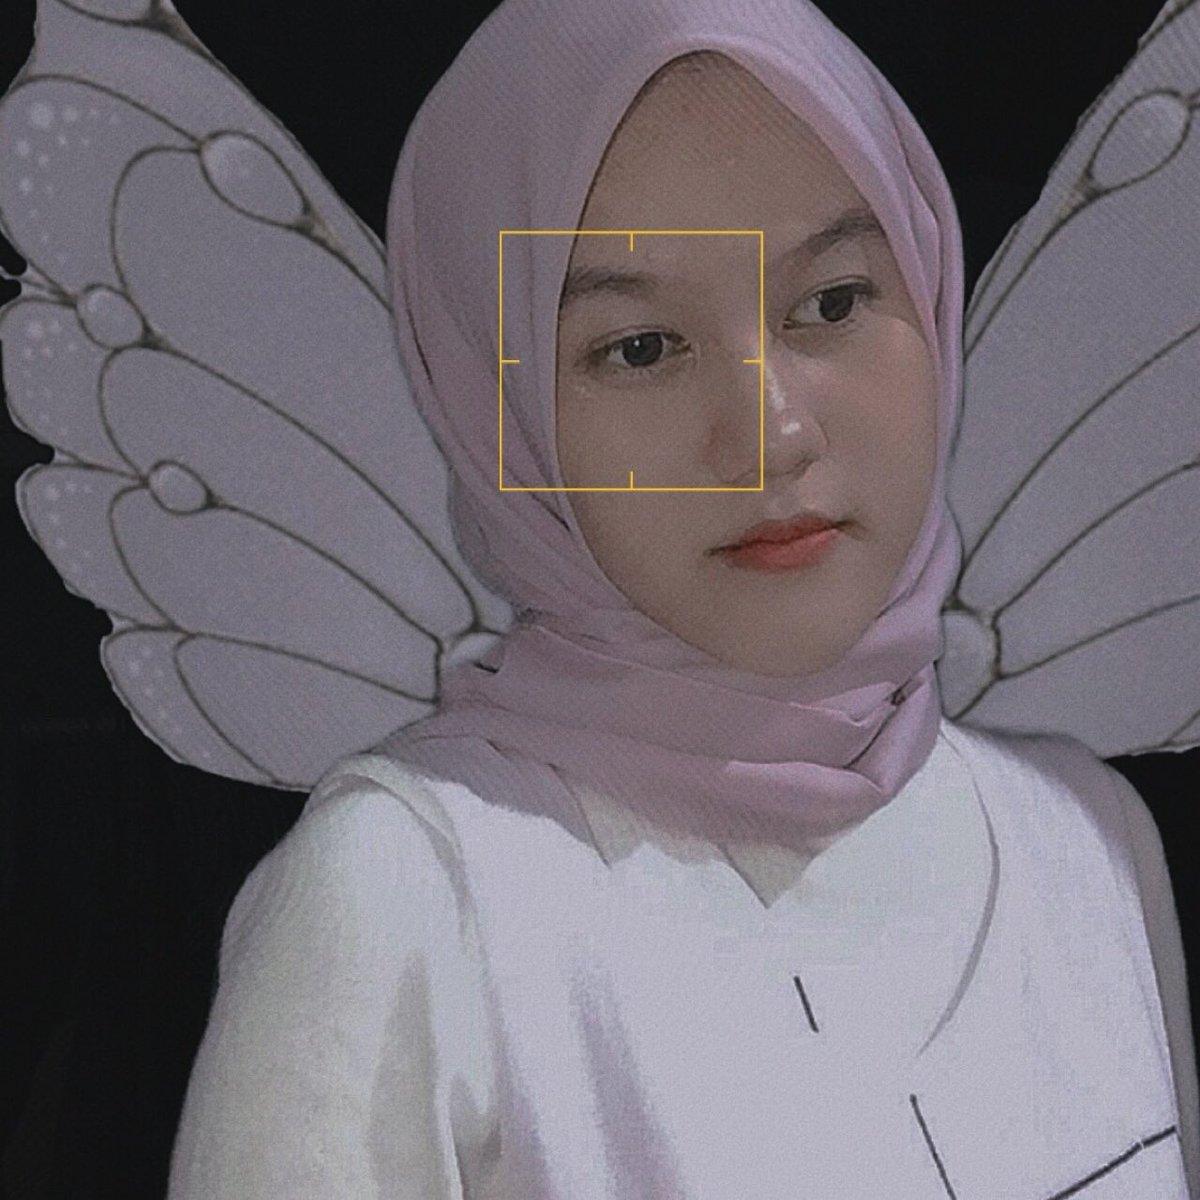 angels or fairies? 👼🏻  #ATSD #AtinySelcaDay #Jongho #종호 #ATEEZ #에이티즈 @ATEEZofficial